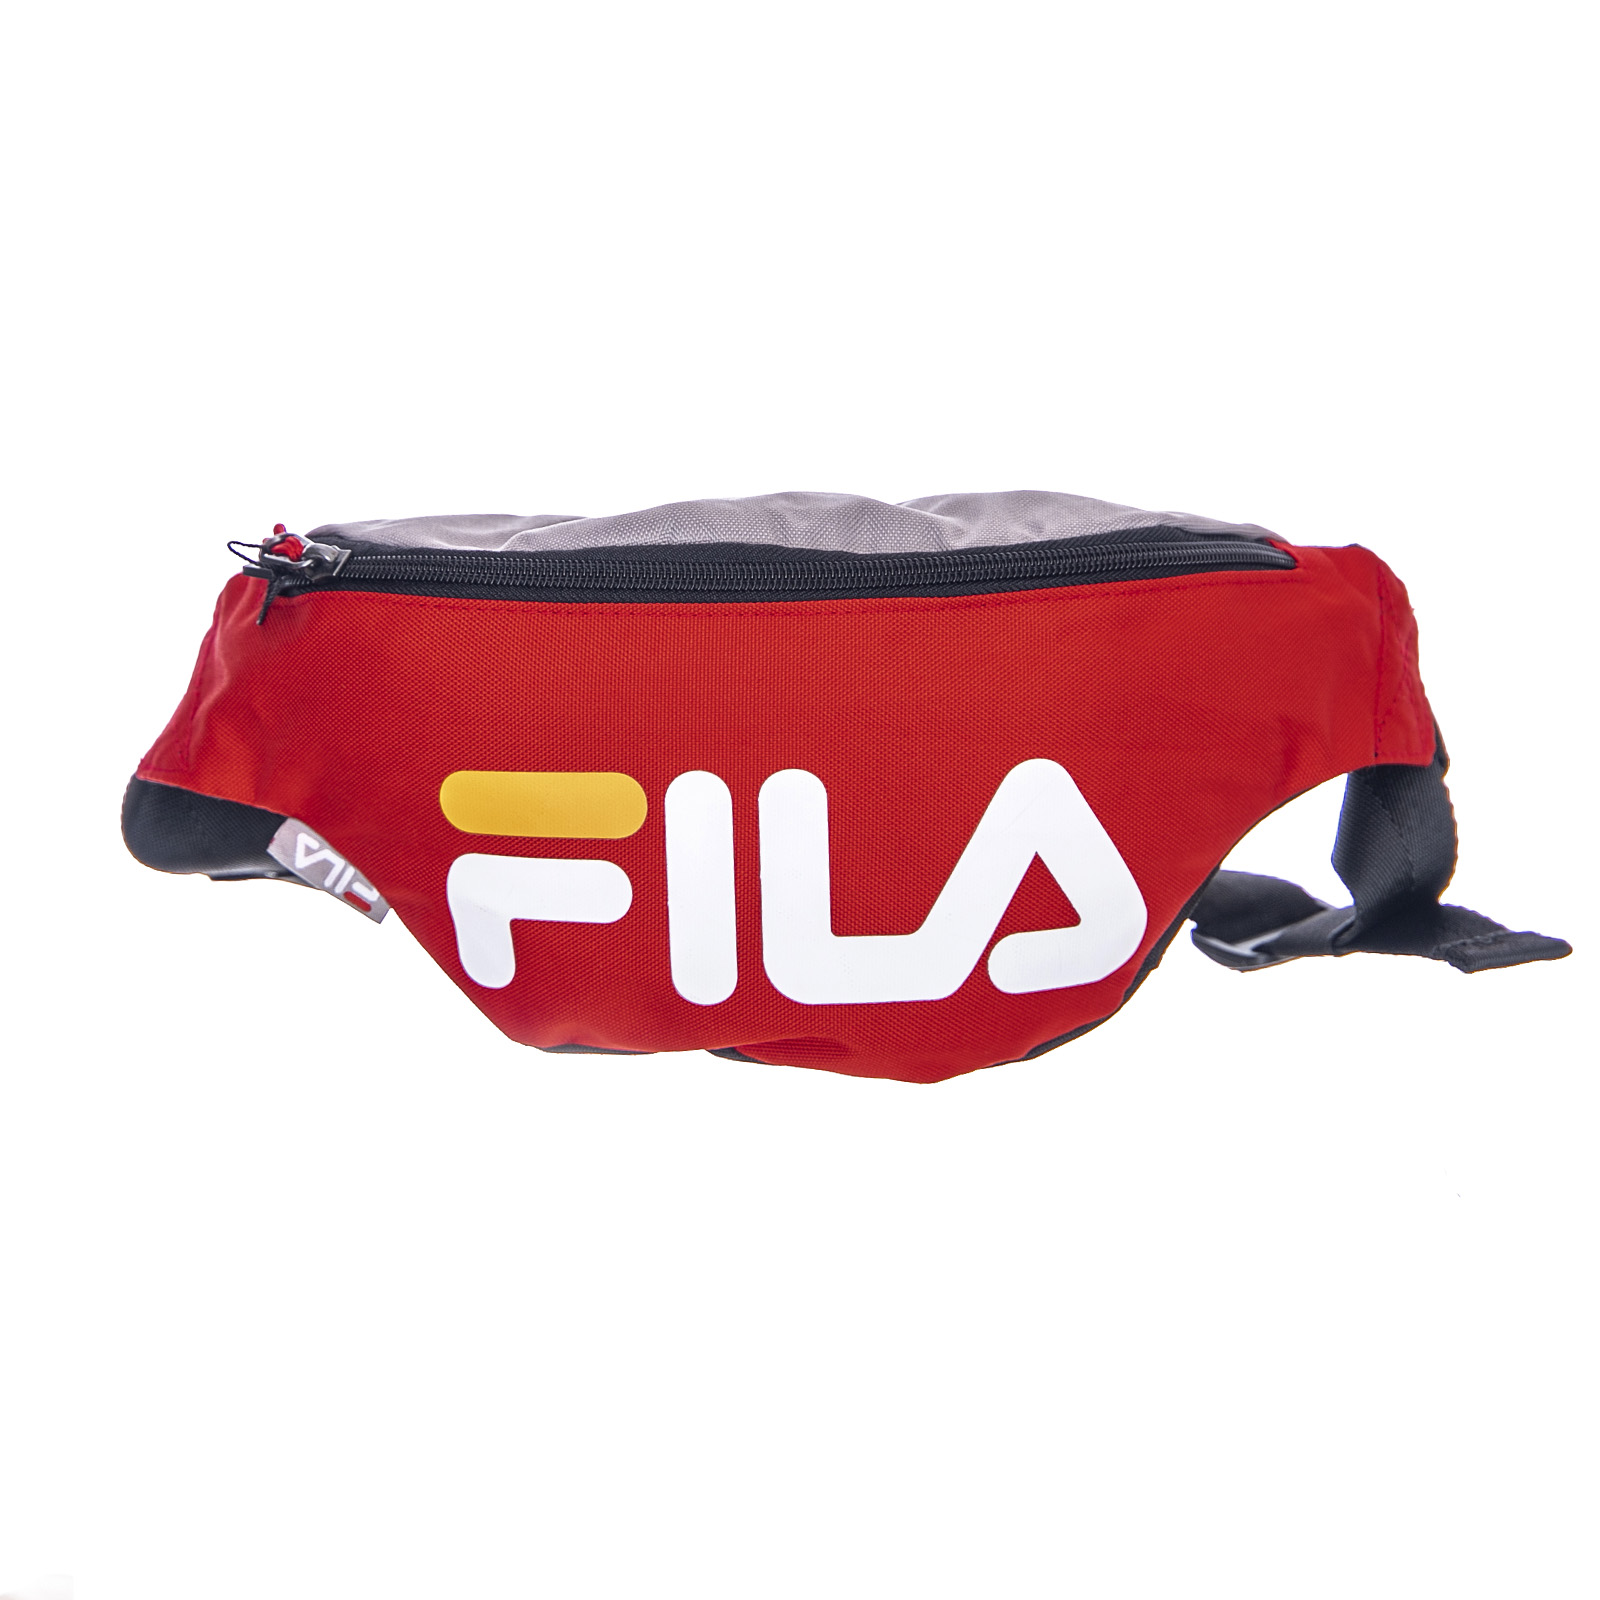 Dettagli su Fila Logo Waist Bag Slim - Blocing Fiery Red - Marsupio Rosso